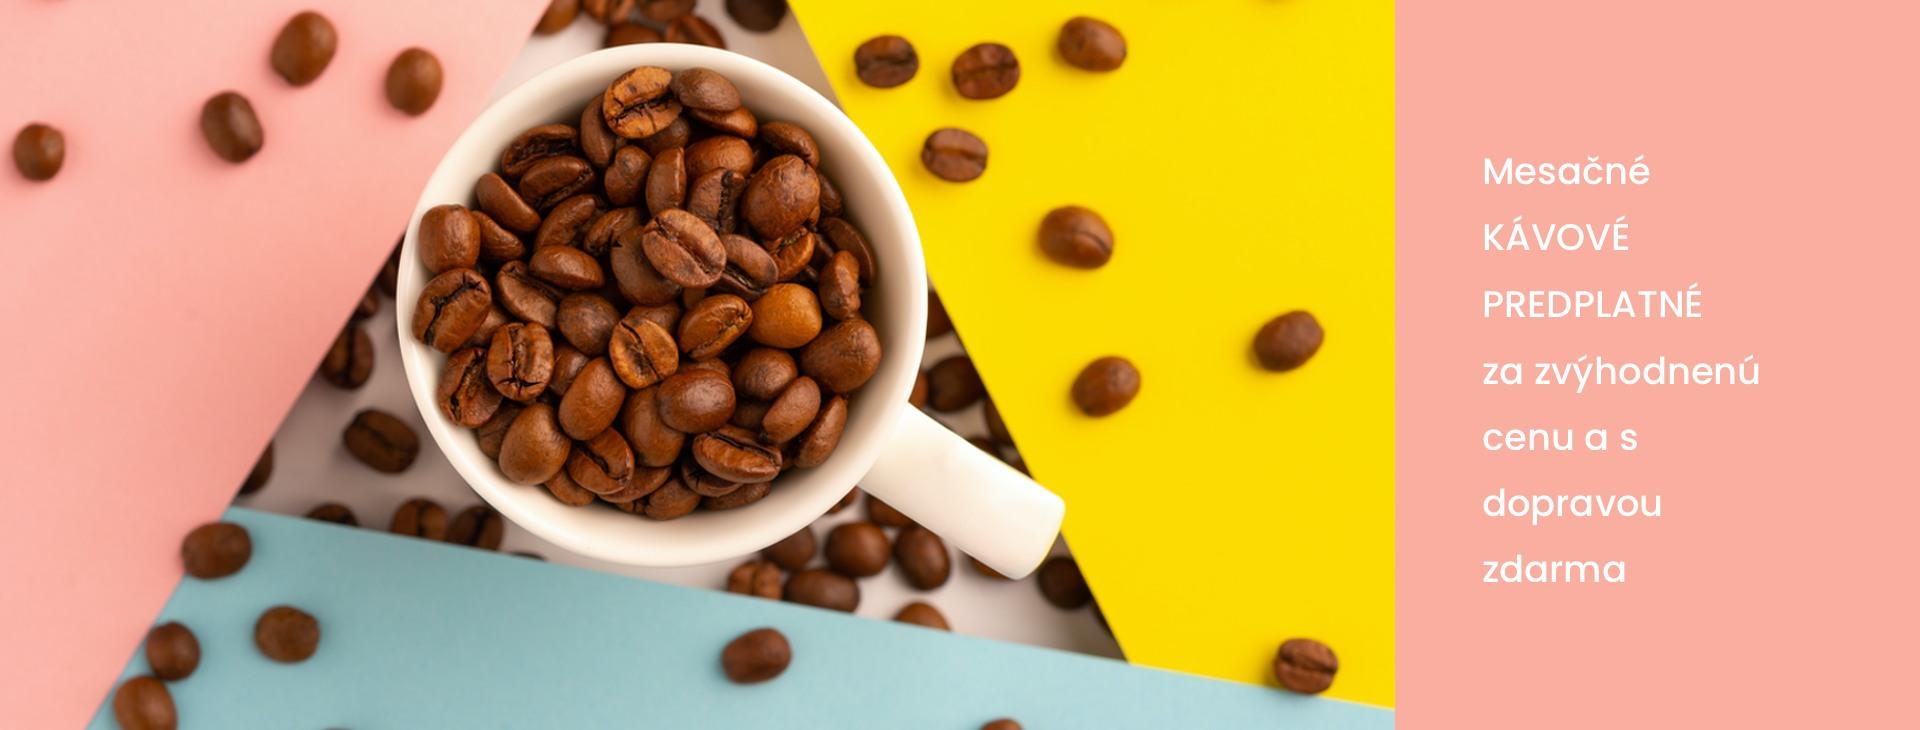 SAMAY Kavove predplatne